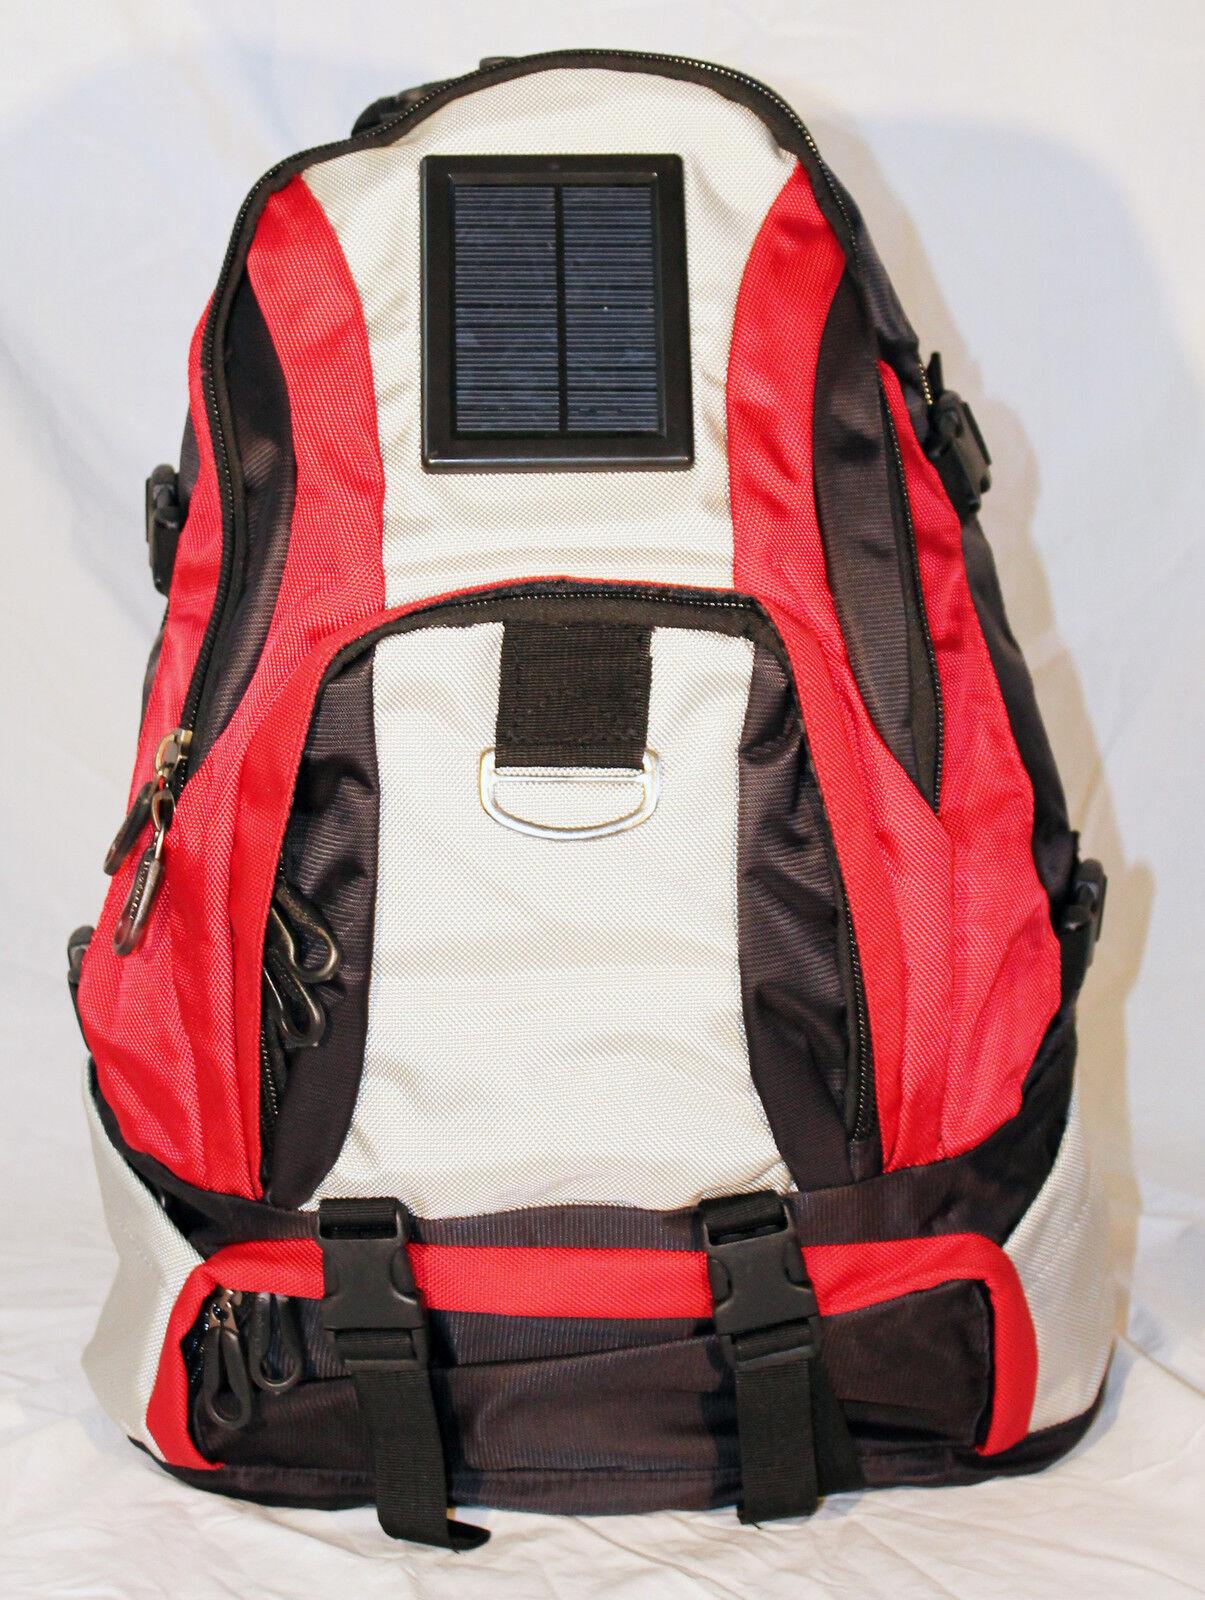 Solar aufladung rucksack rucksack inkl. batterie & verbinder zelten festival